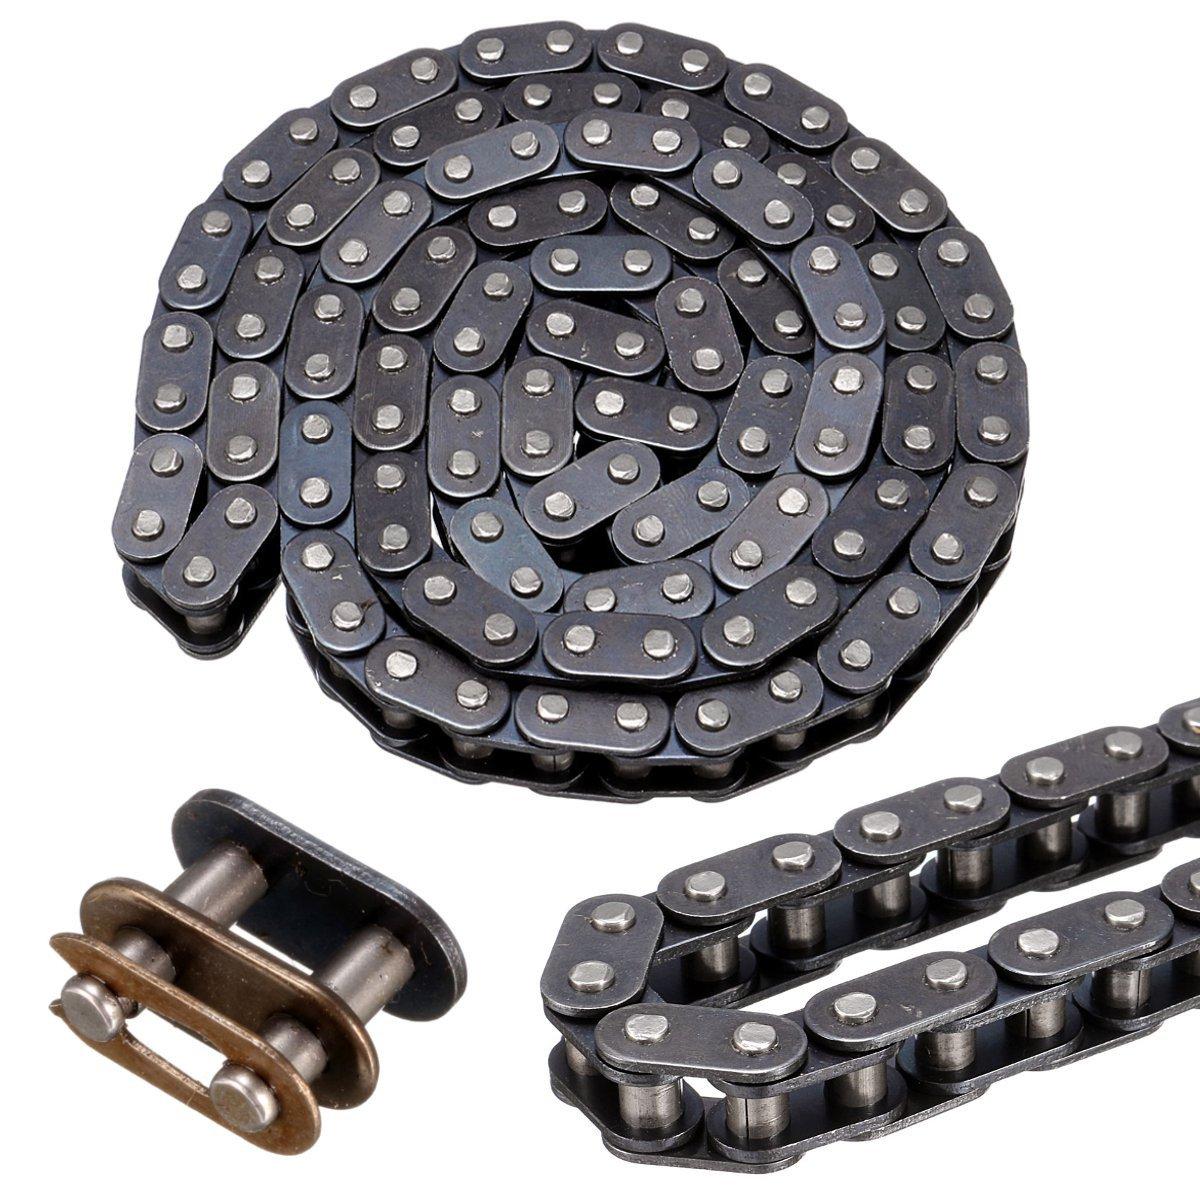 ILS –  T8 F Chain Belt with Buckle Link 116 for 43 cc 47 cc 49 cc Mini Dirt ATV Quad Mini Moto I LOVE SHOPPING